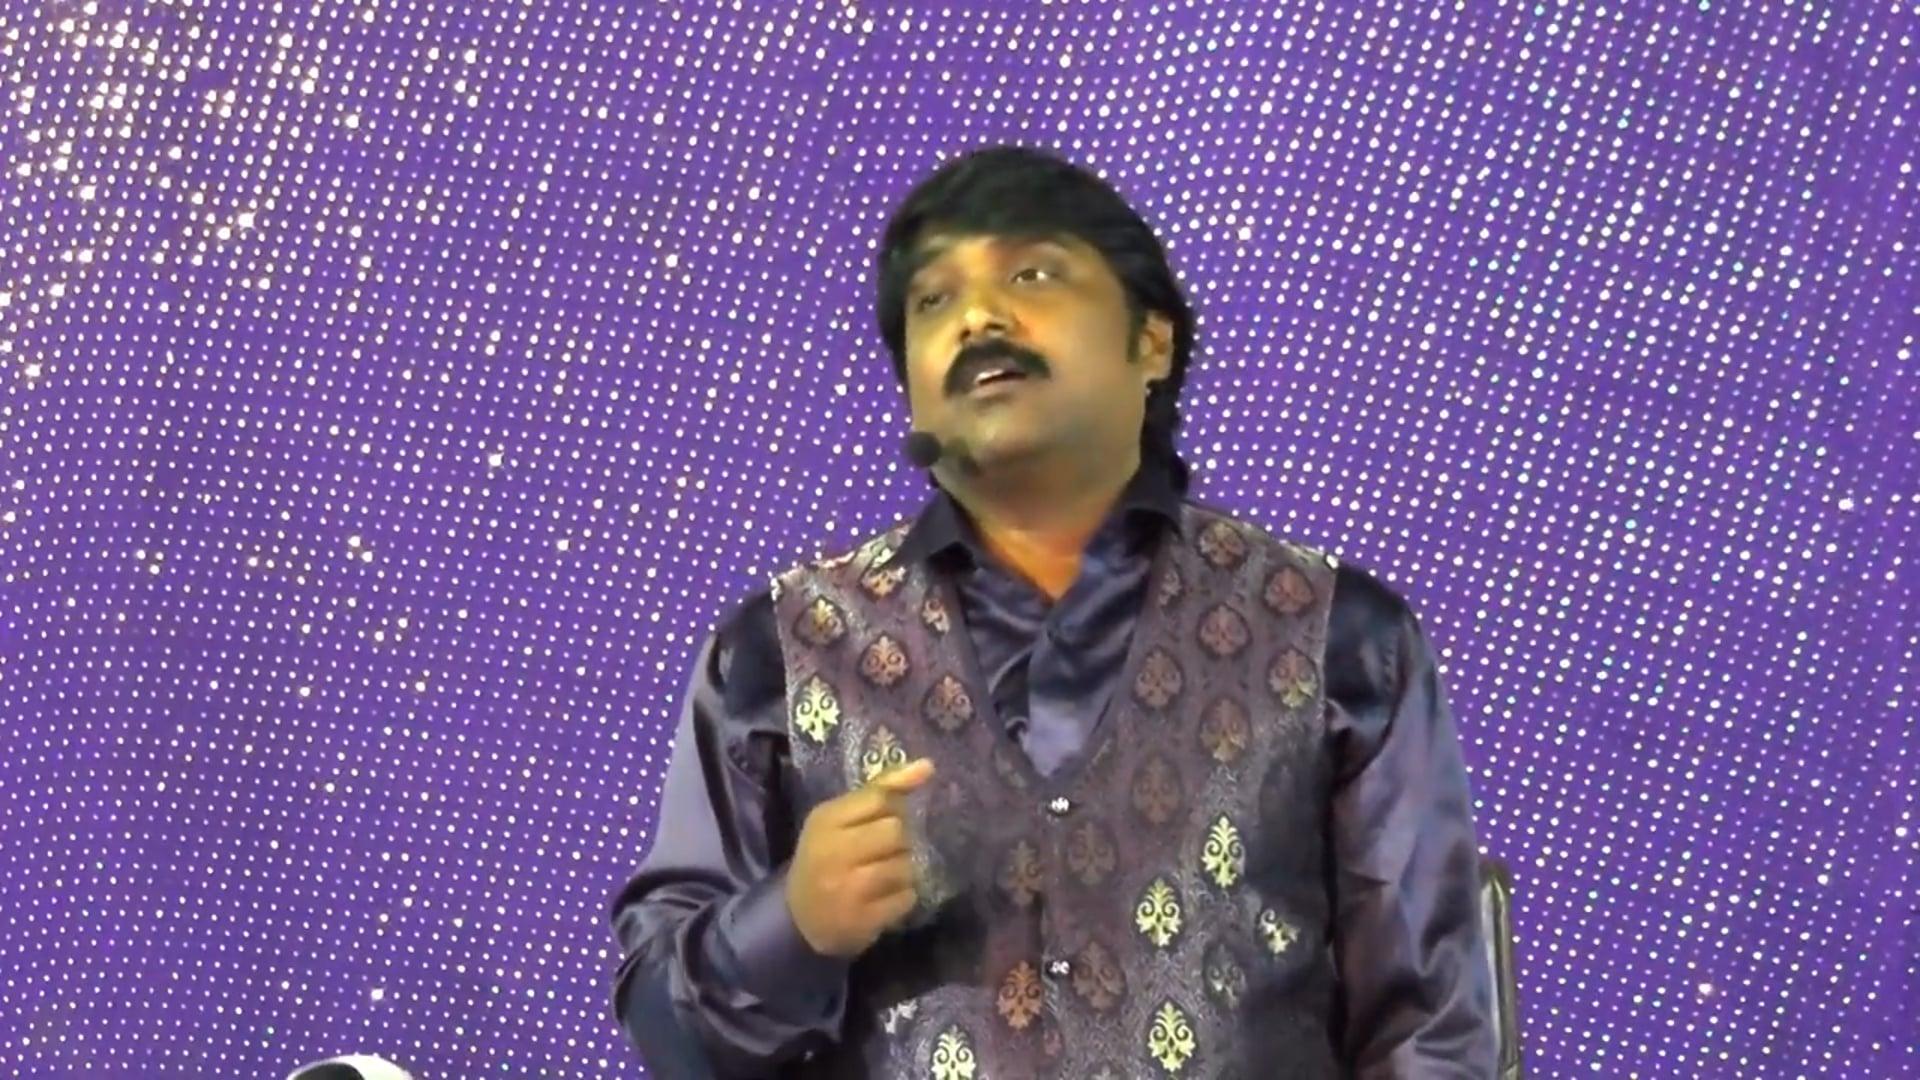 - _ _ LPrasanna Babu _ Undi _ Day-3 _ Jayashalitv Live